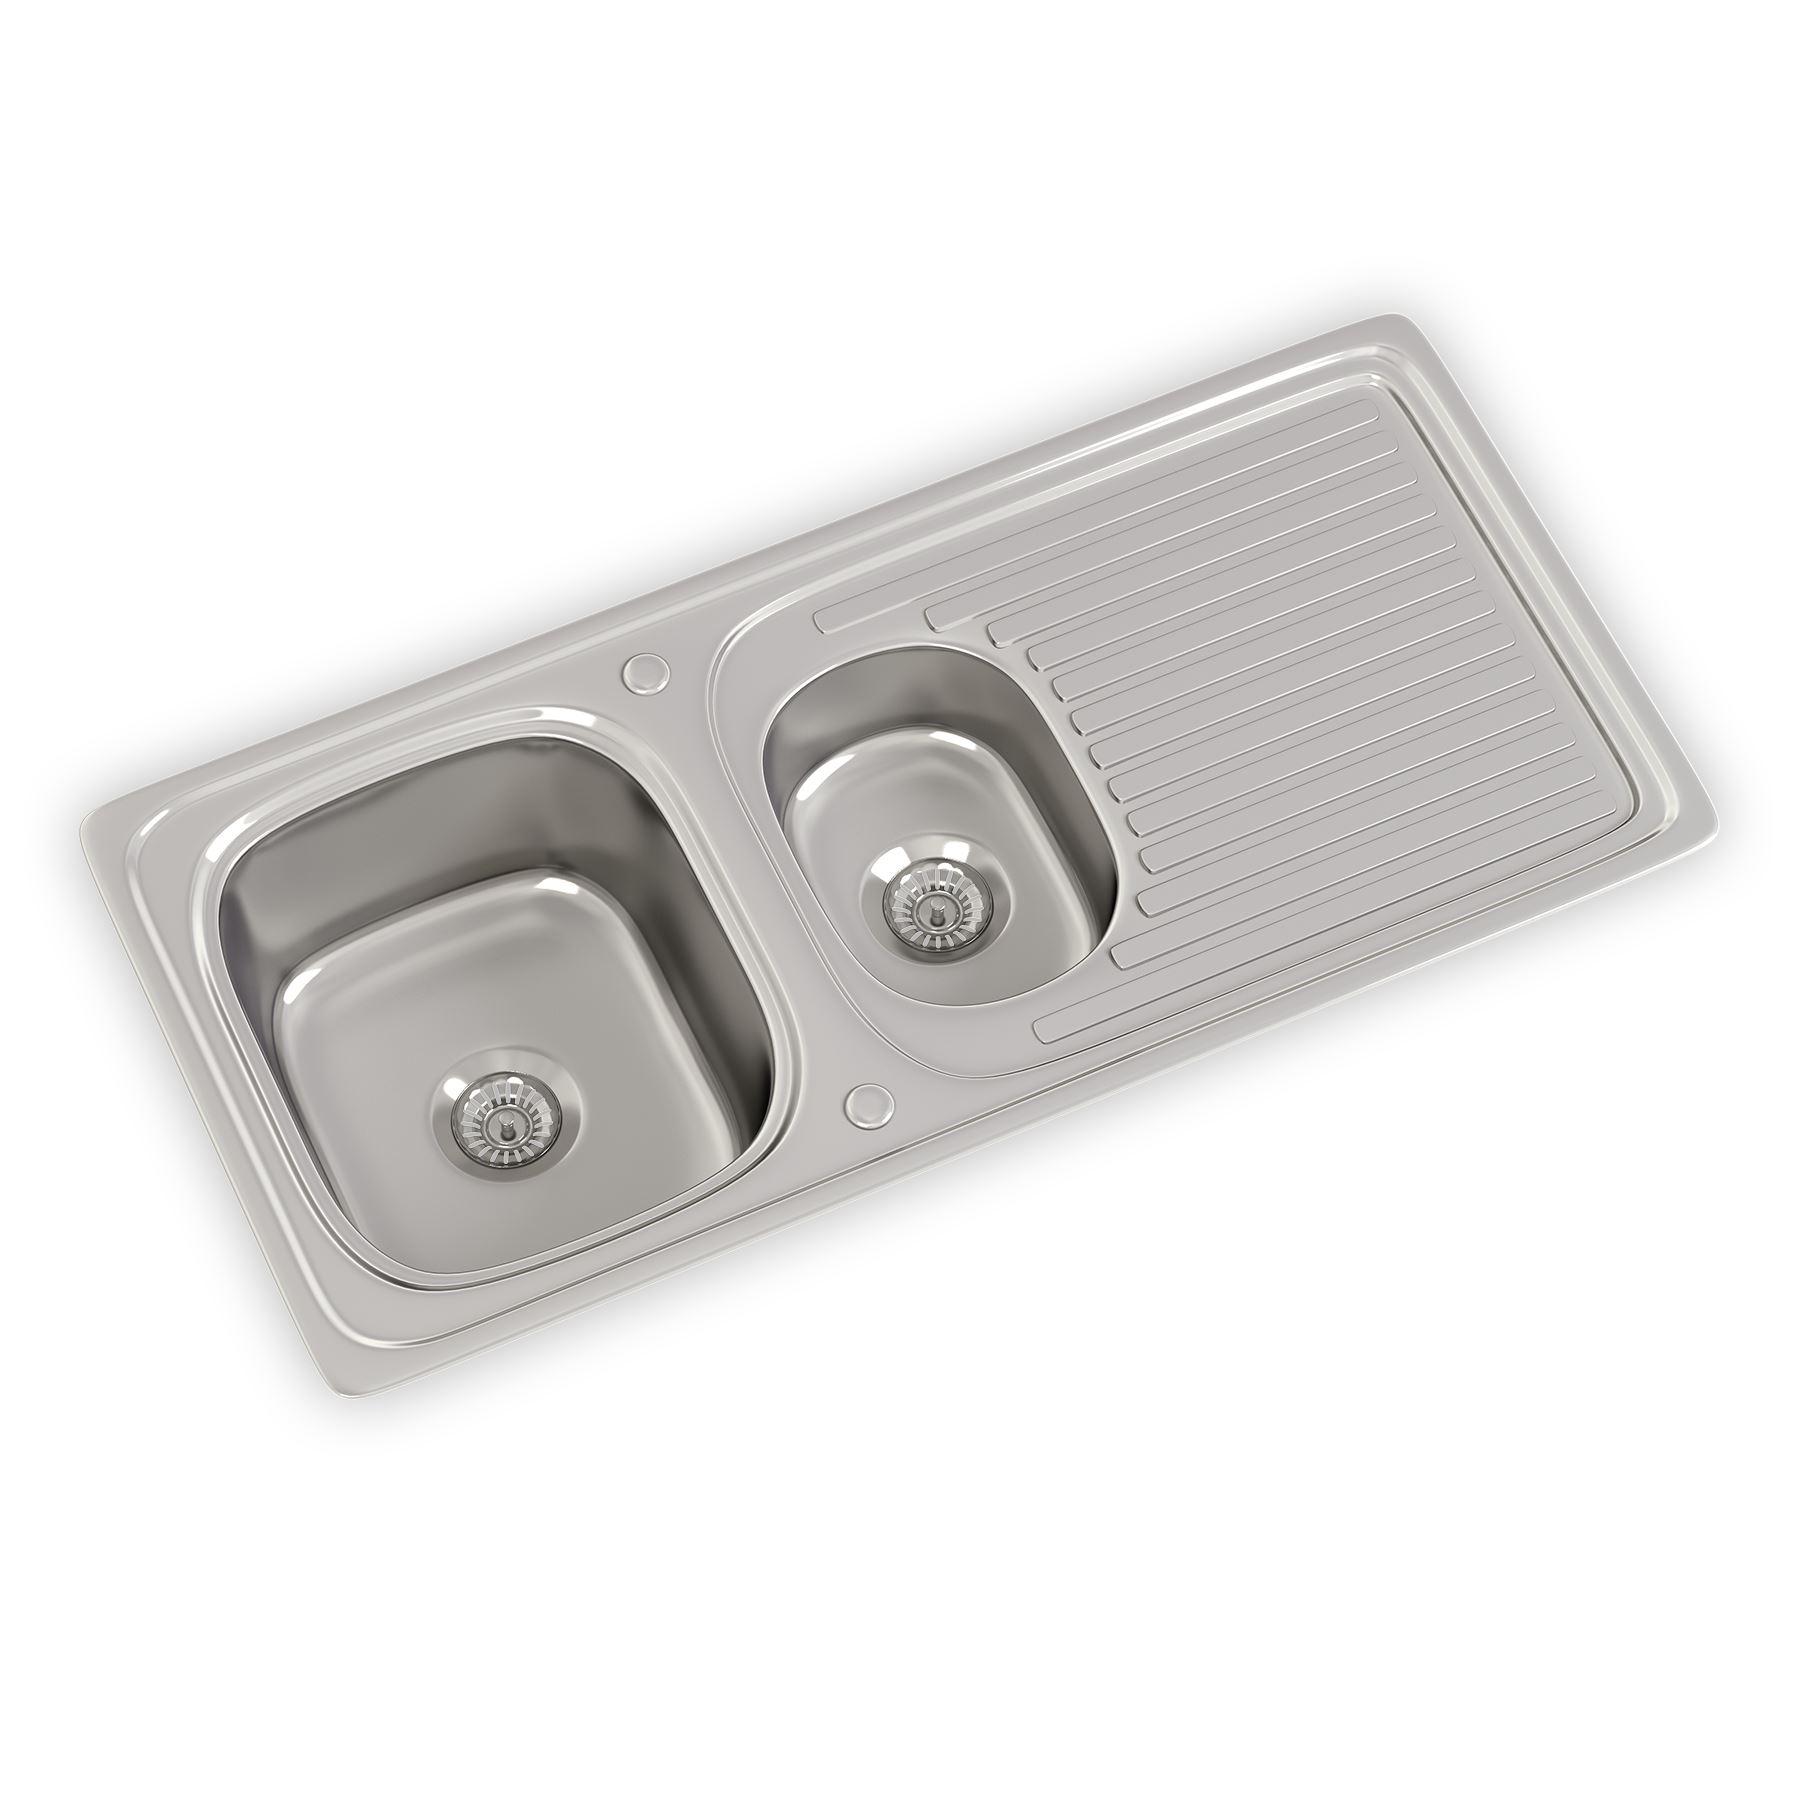 New stainless steel kitchen sink amp waste single